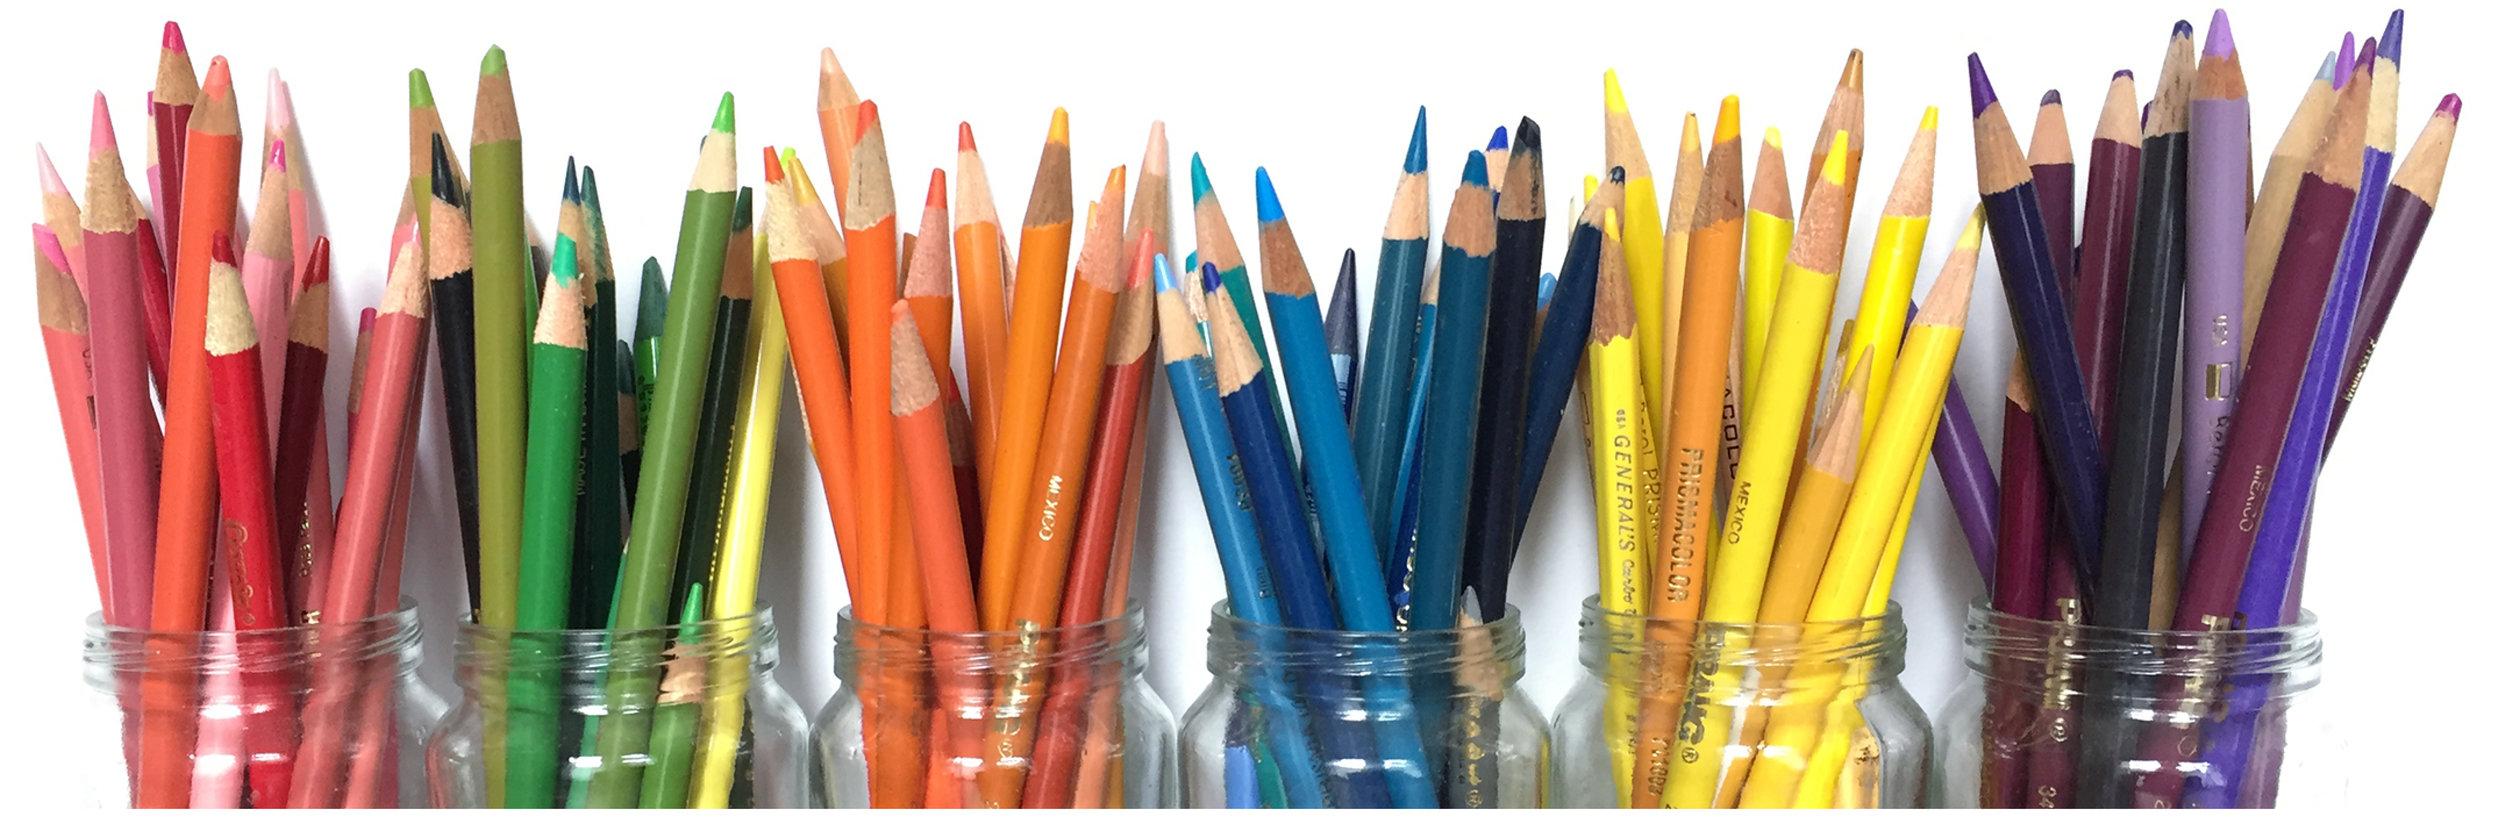 Pencils words.jpg